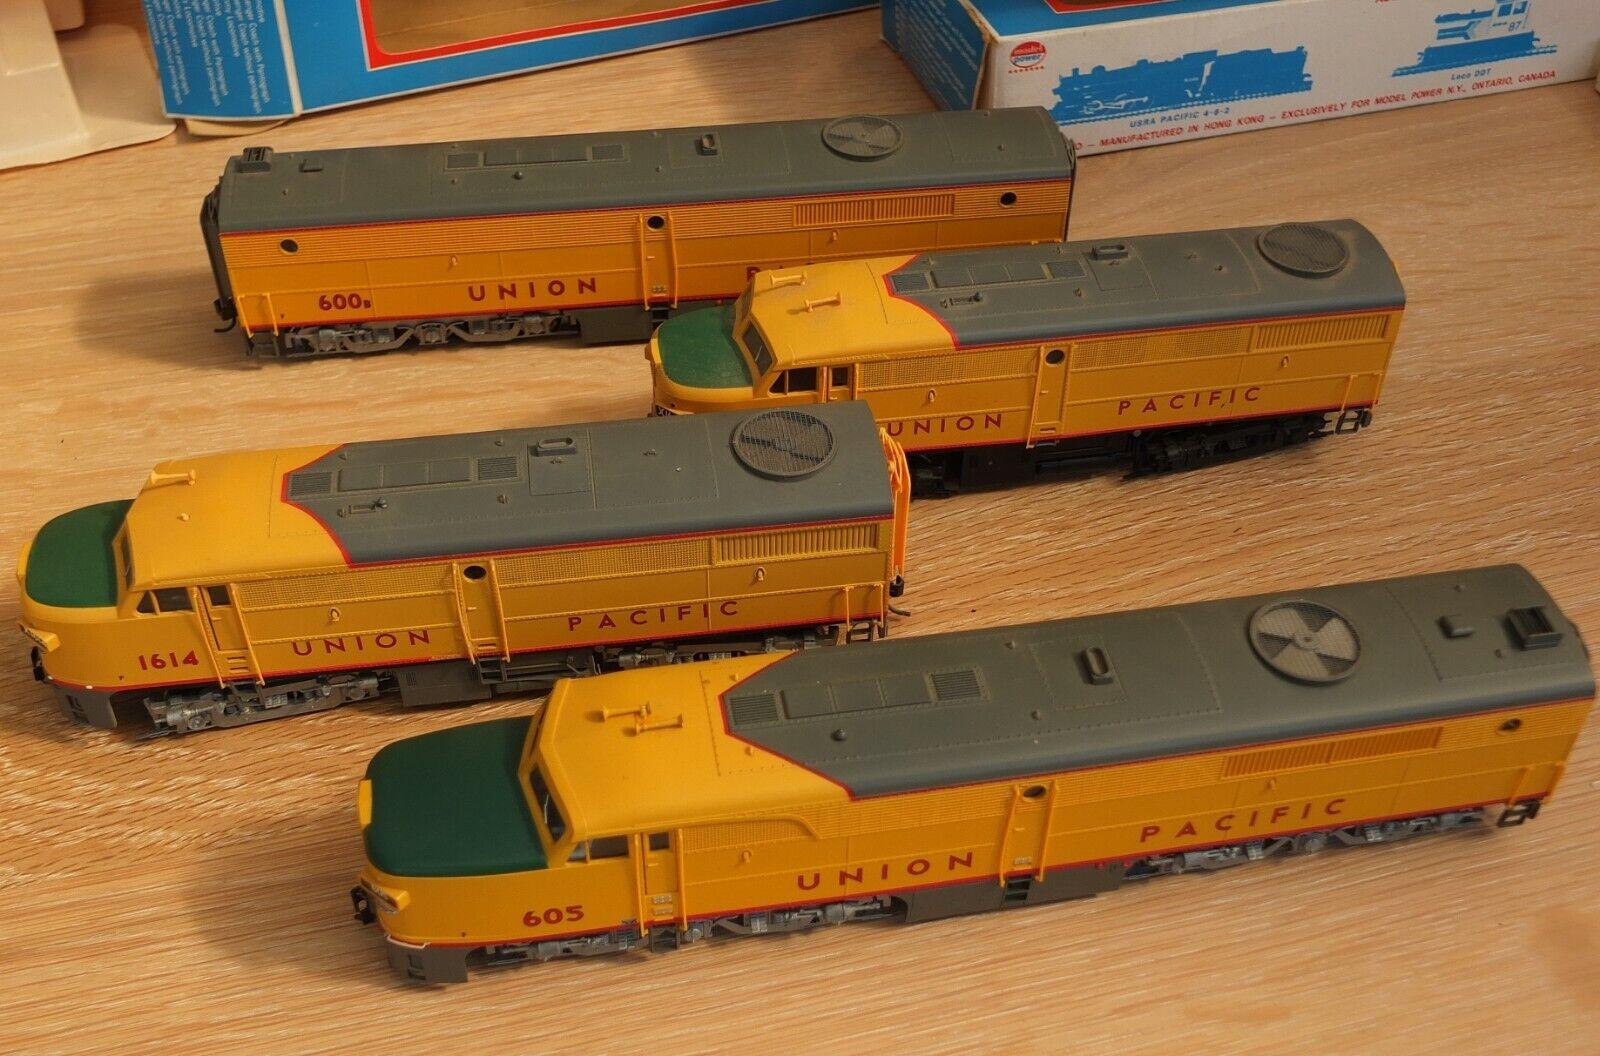 Walthers Life-Like HO OO Gauge 4 x Union Pacific Locomotives 1614 605 1643 600B